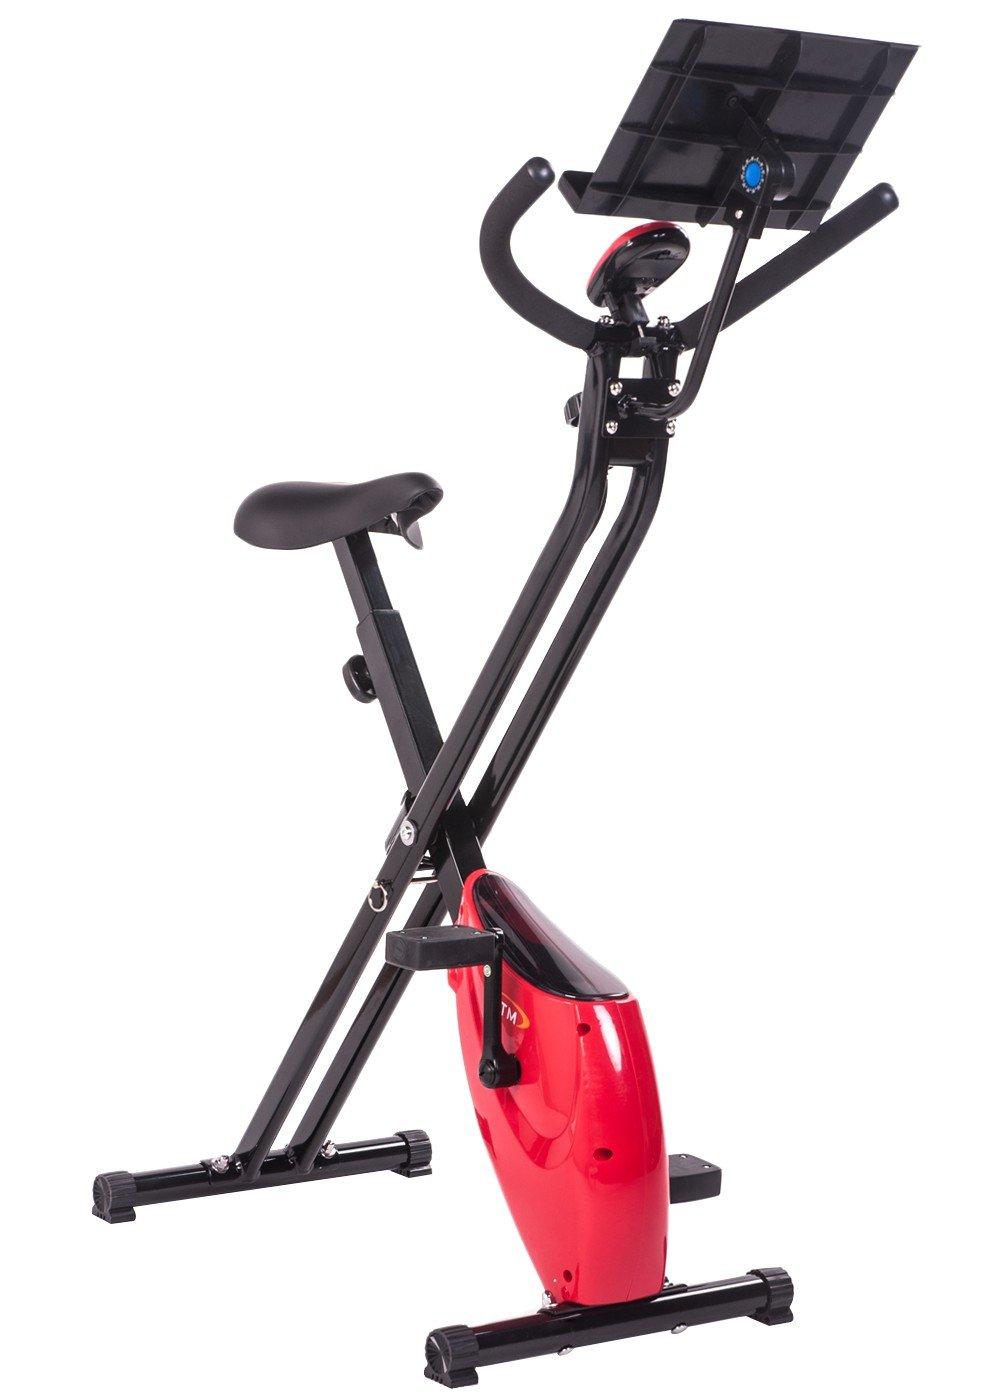 BTM bicicleta estática magnética plegable